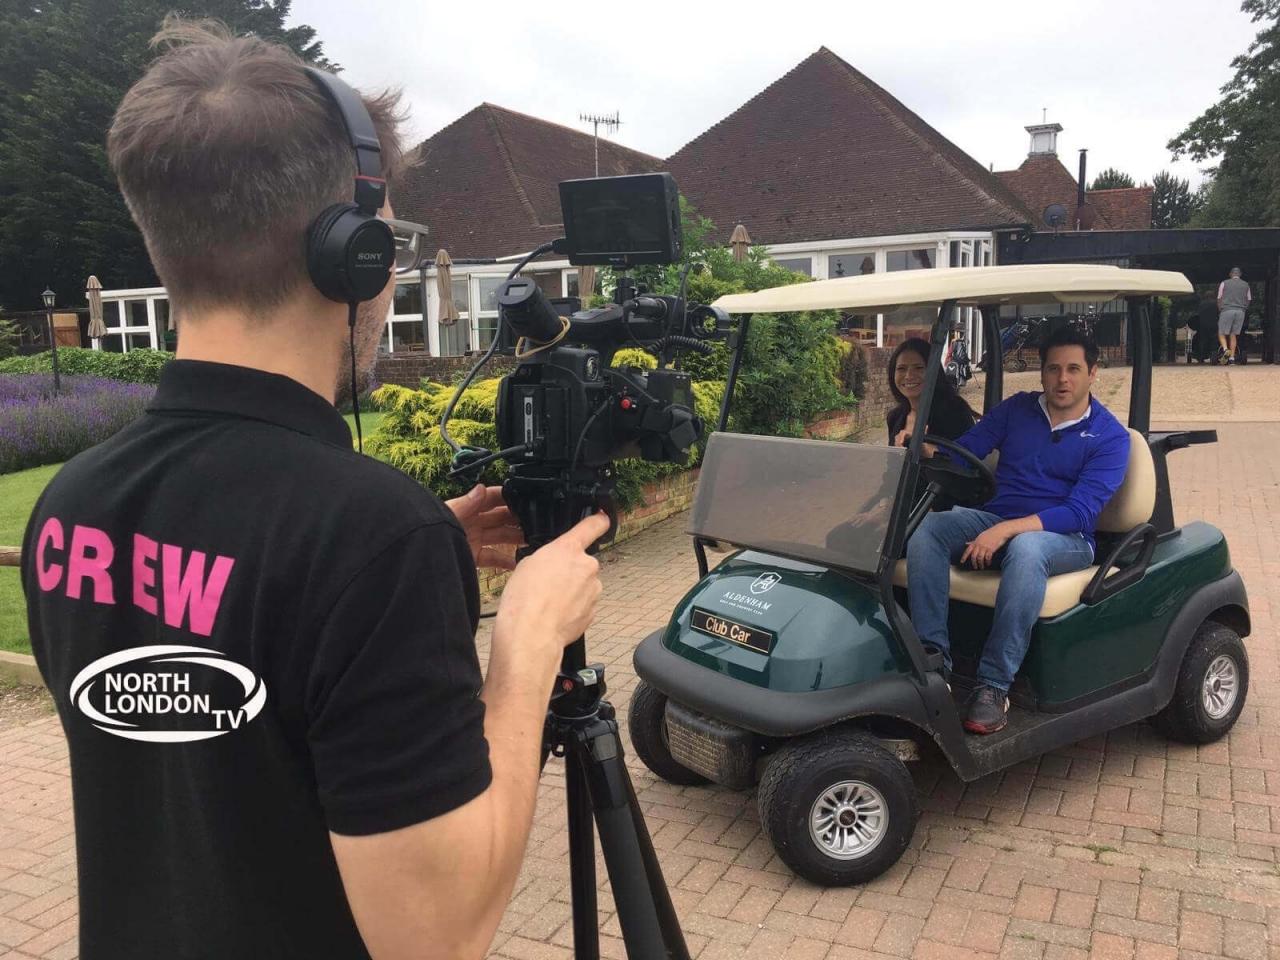 >North London TV: Series 1 Episode 1